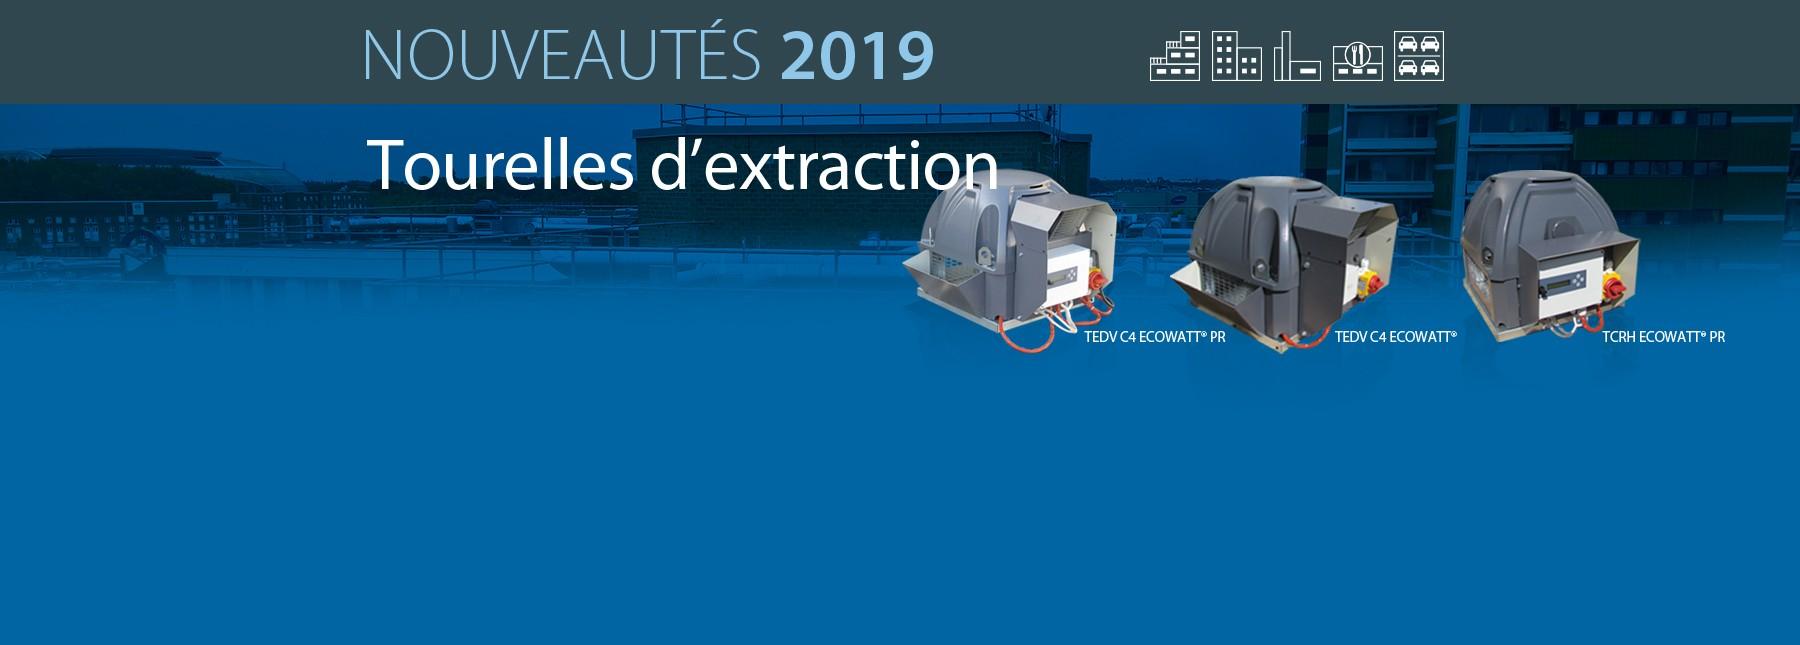 Nouveautés Tourelles d'extraction TCRH-V - TEDH-V - ECOWATT - ECOWATT PR